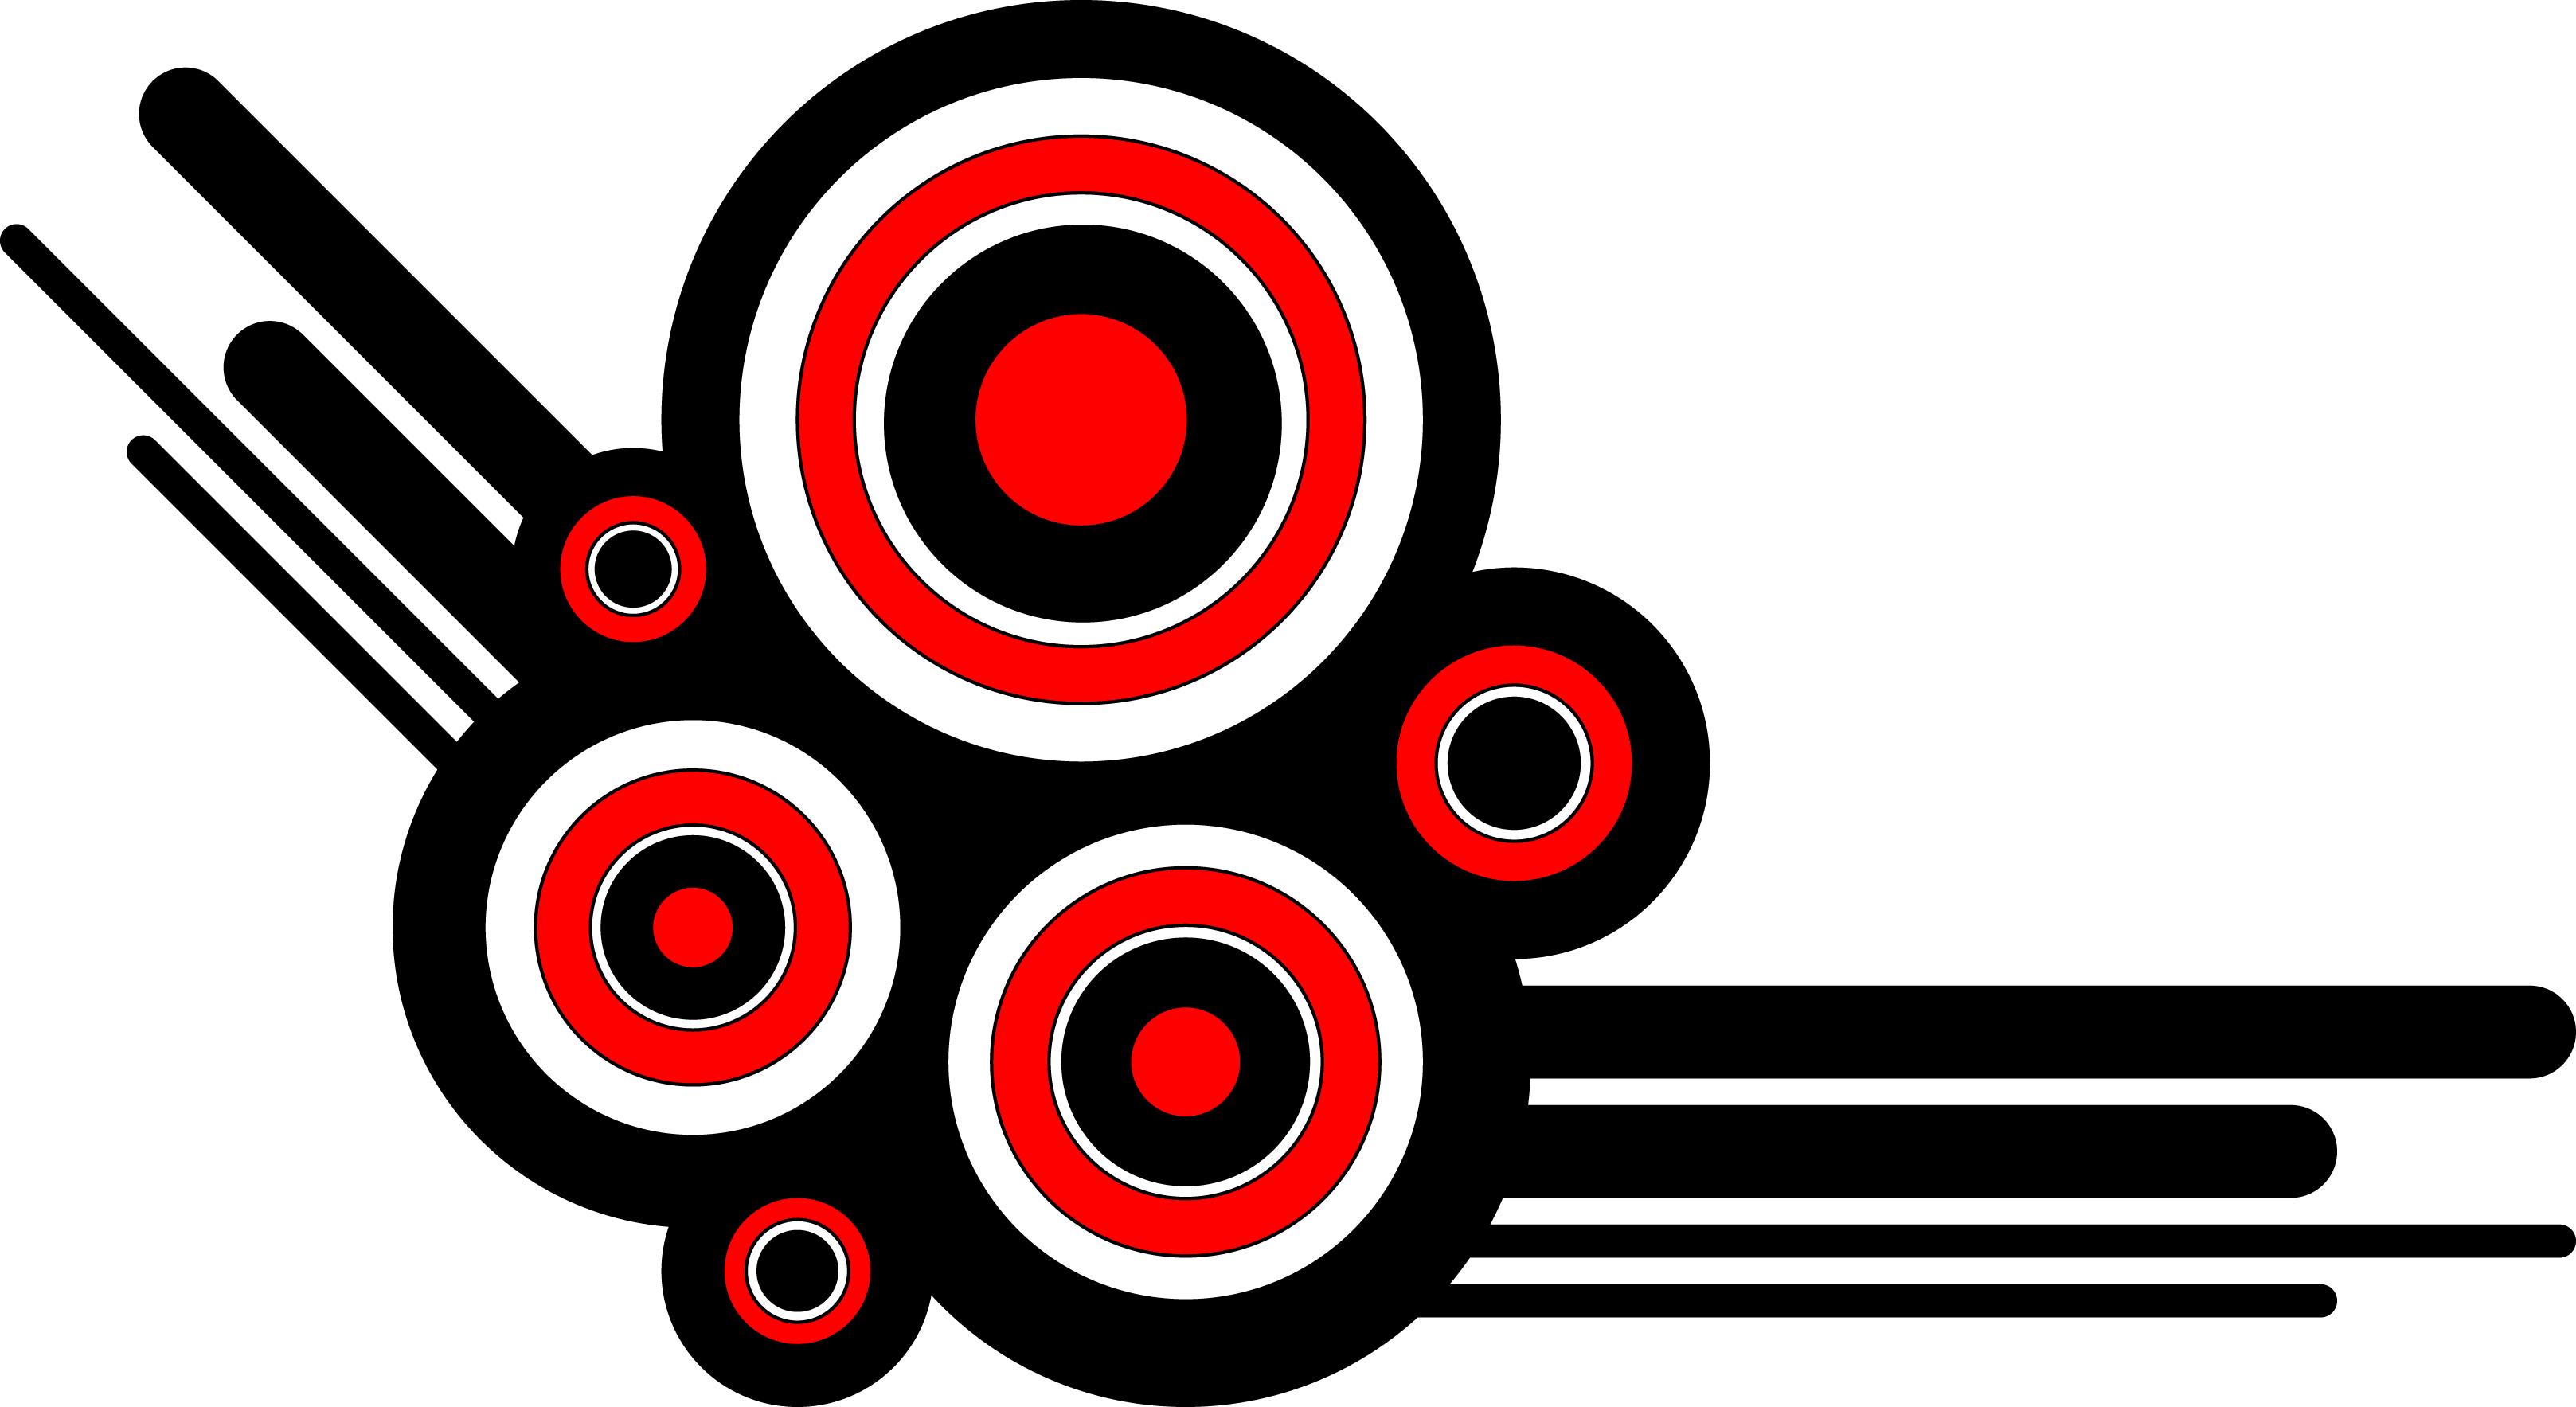 bc55ac2c23cd1 red black white by trumpo on DeviantArt